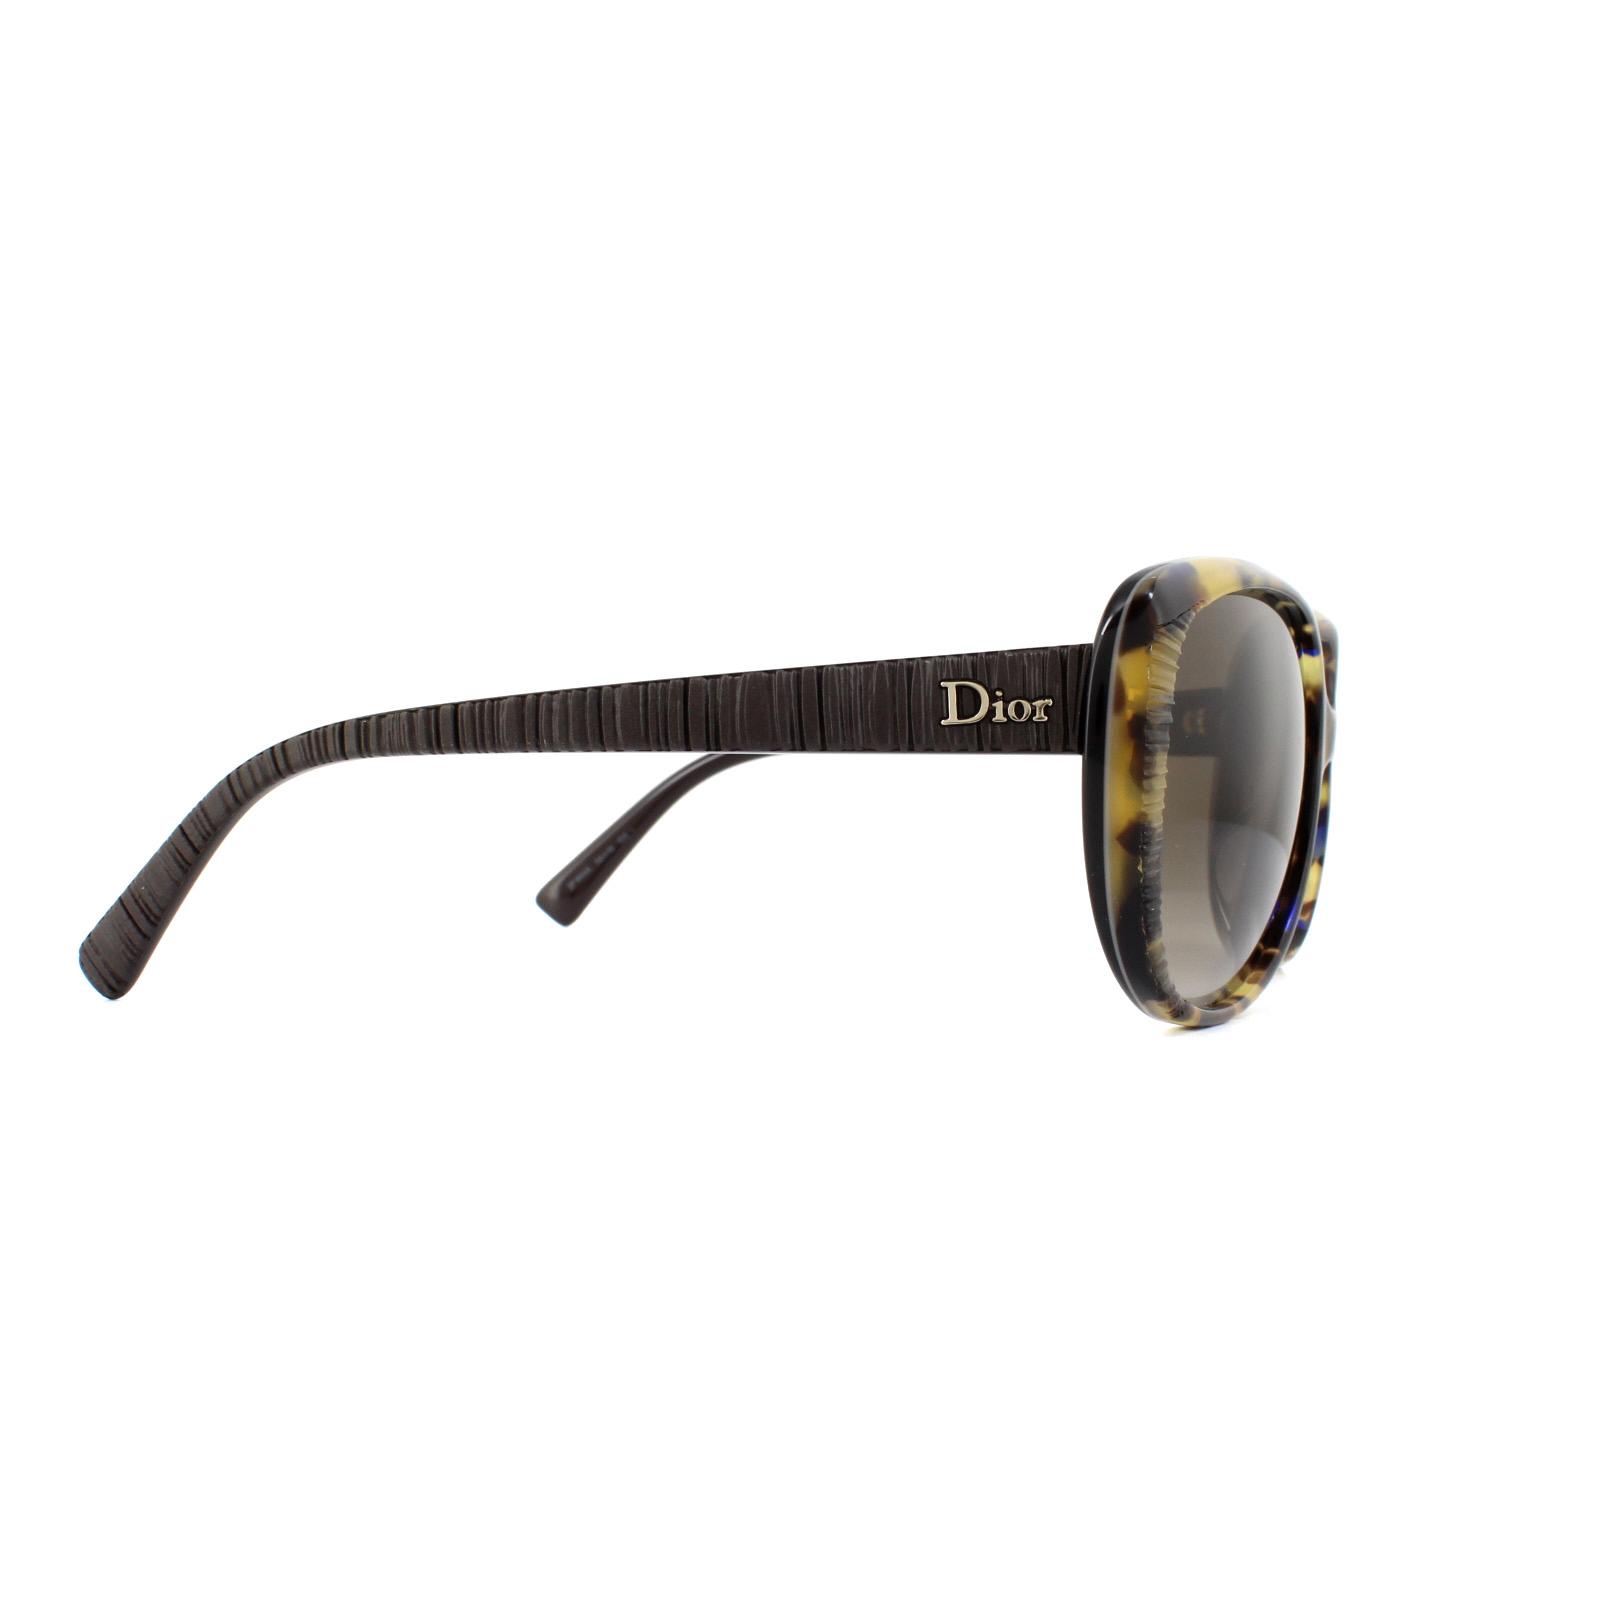 60468b76610d Dior Sunglasses Dior TaffetaSK 2FW HA Brown Havana Brown Gradient